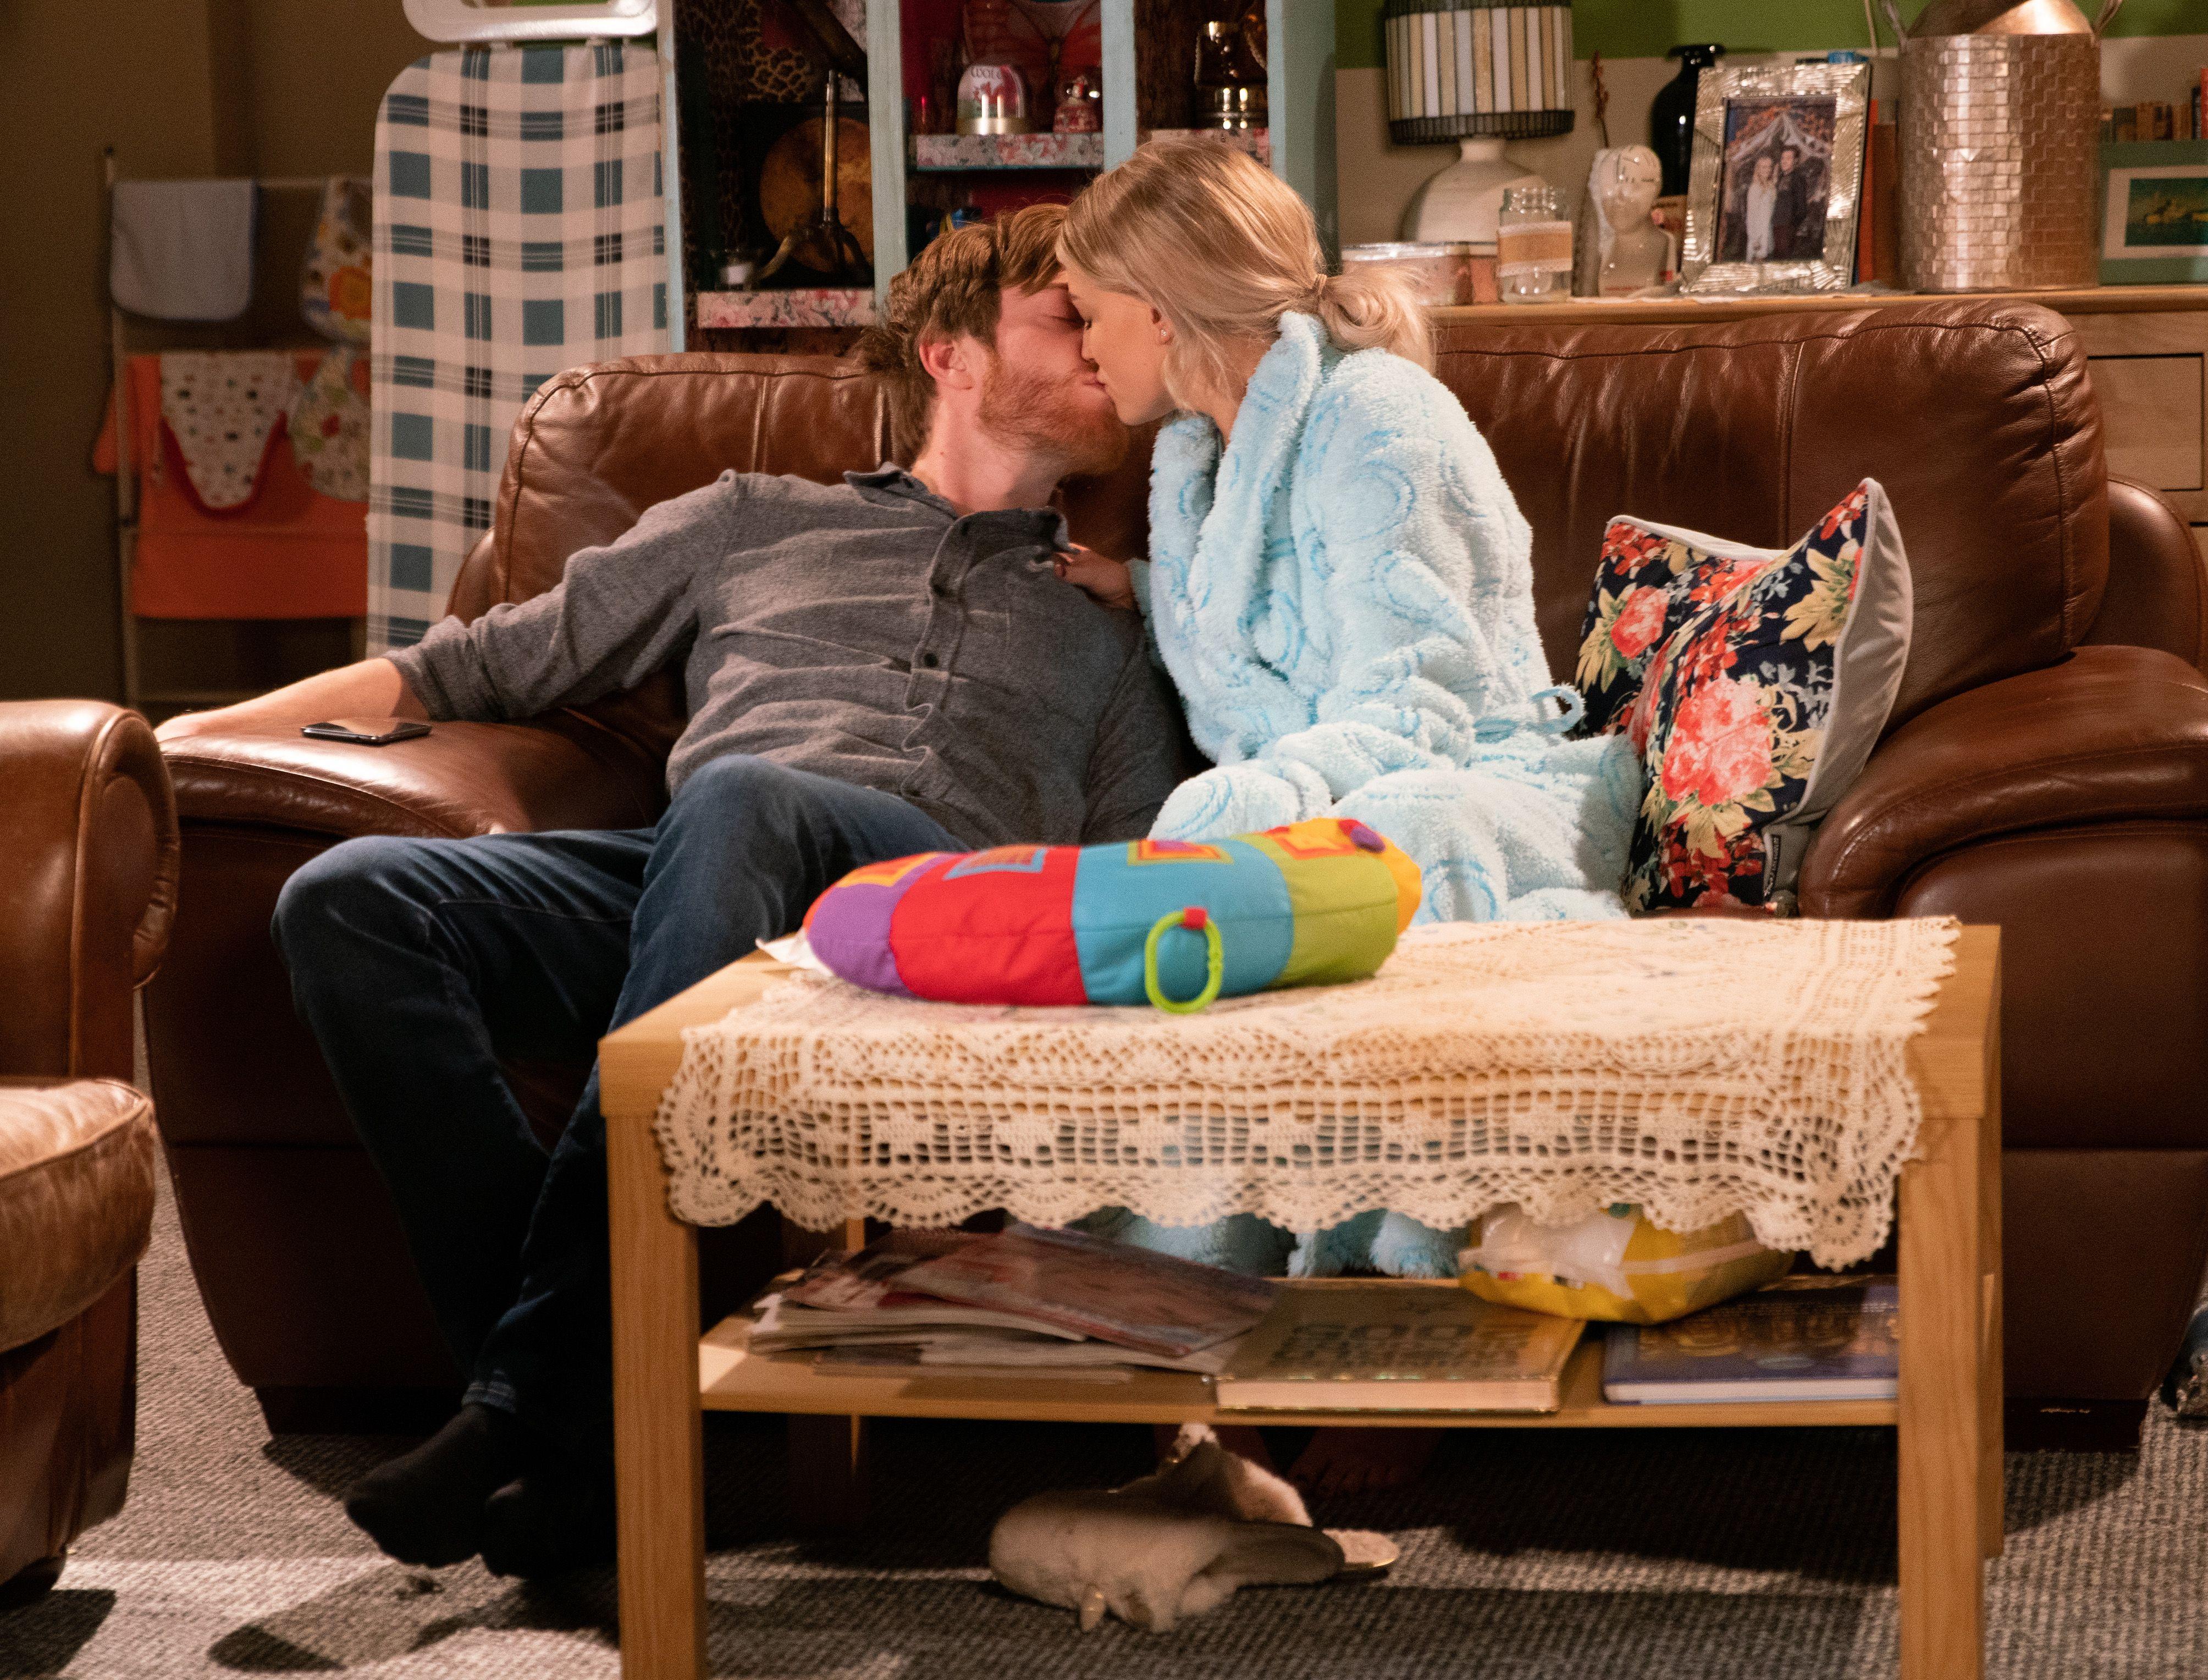 Coronation Street's Daniel Osbourne kisses Bethany Platt – but he's thinking about Sinead